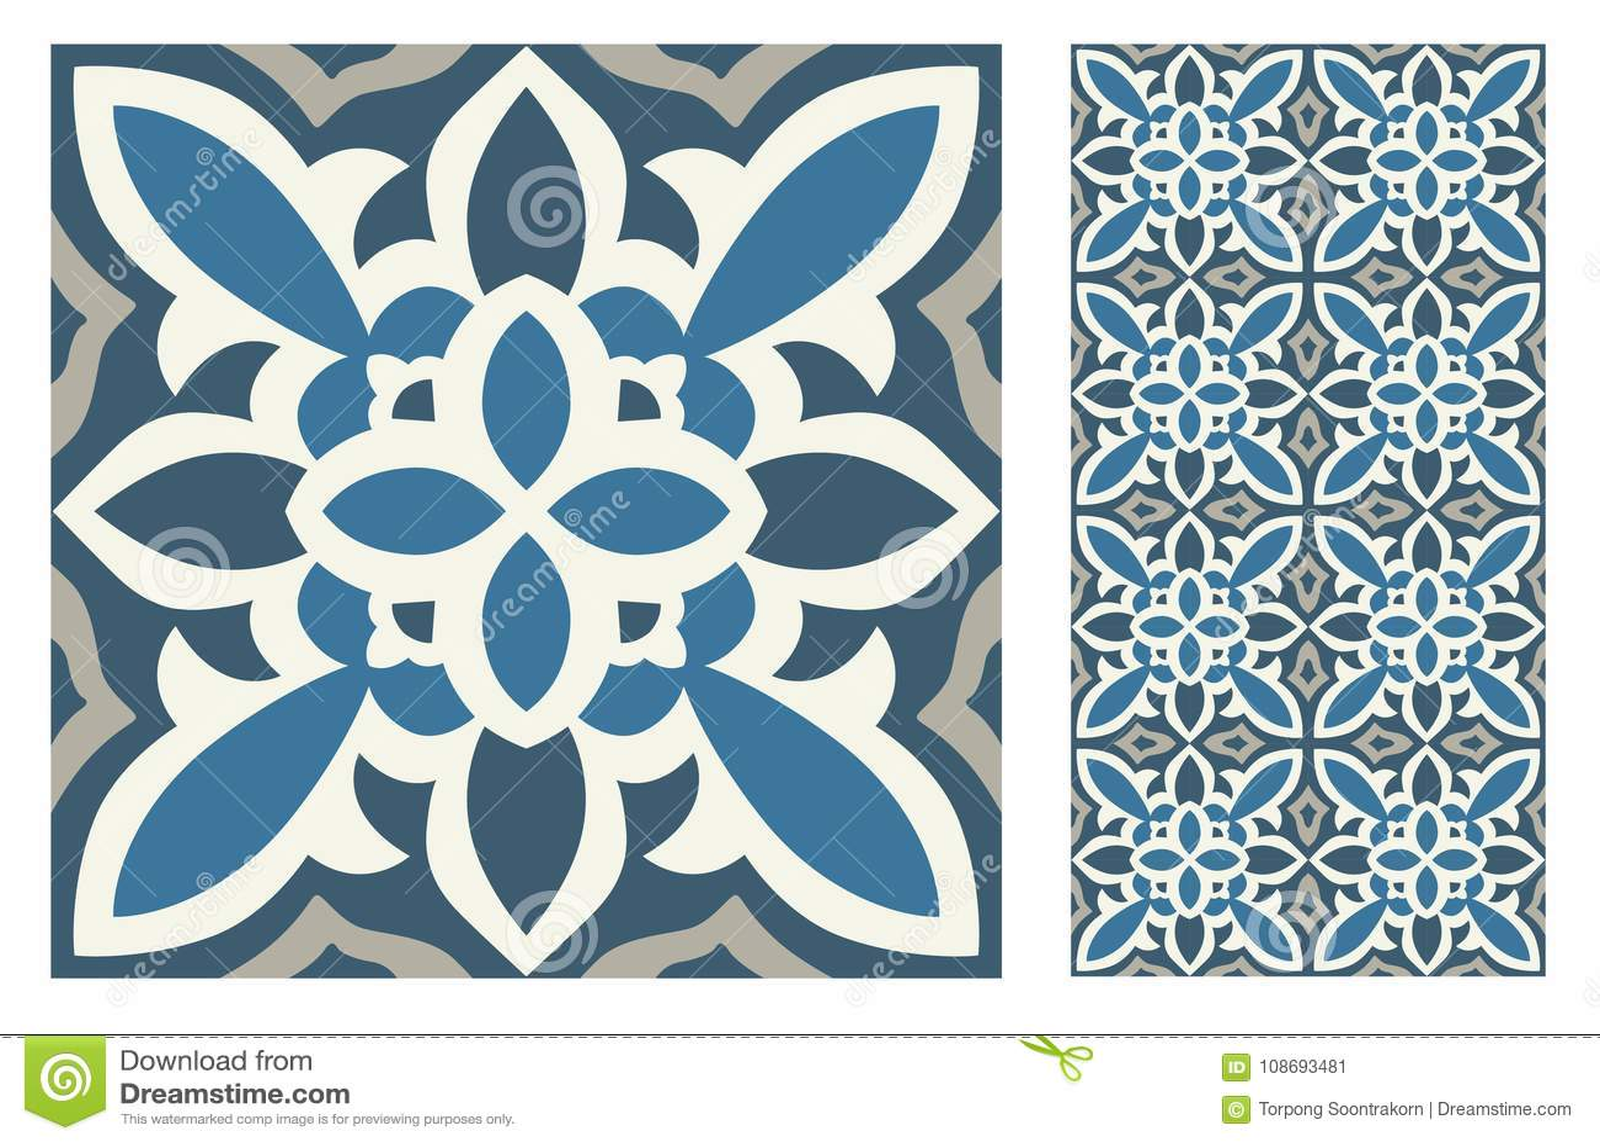 Vintage Antique Seamless Design Patterns Tiles In Vector ...